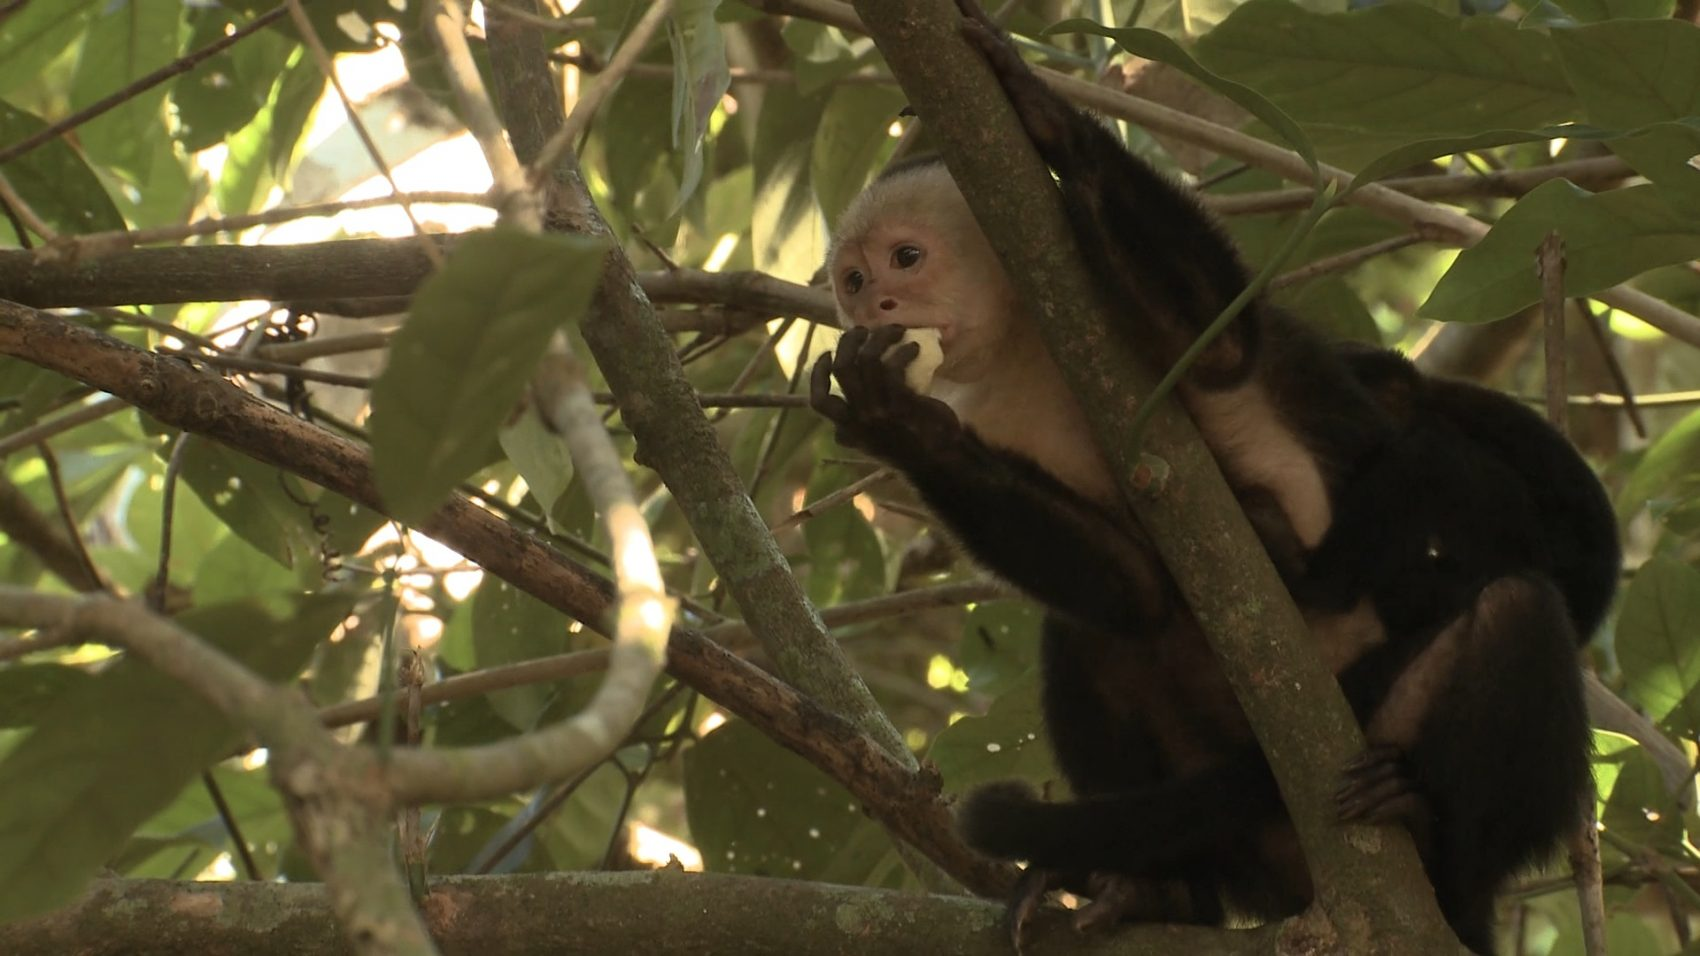 White Face Capuchin Monkey Wildlife - Rincon de la Vieja National Park Tours - Native's Way Costa Rica - Tamarindo Tours and Transfers